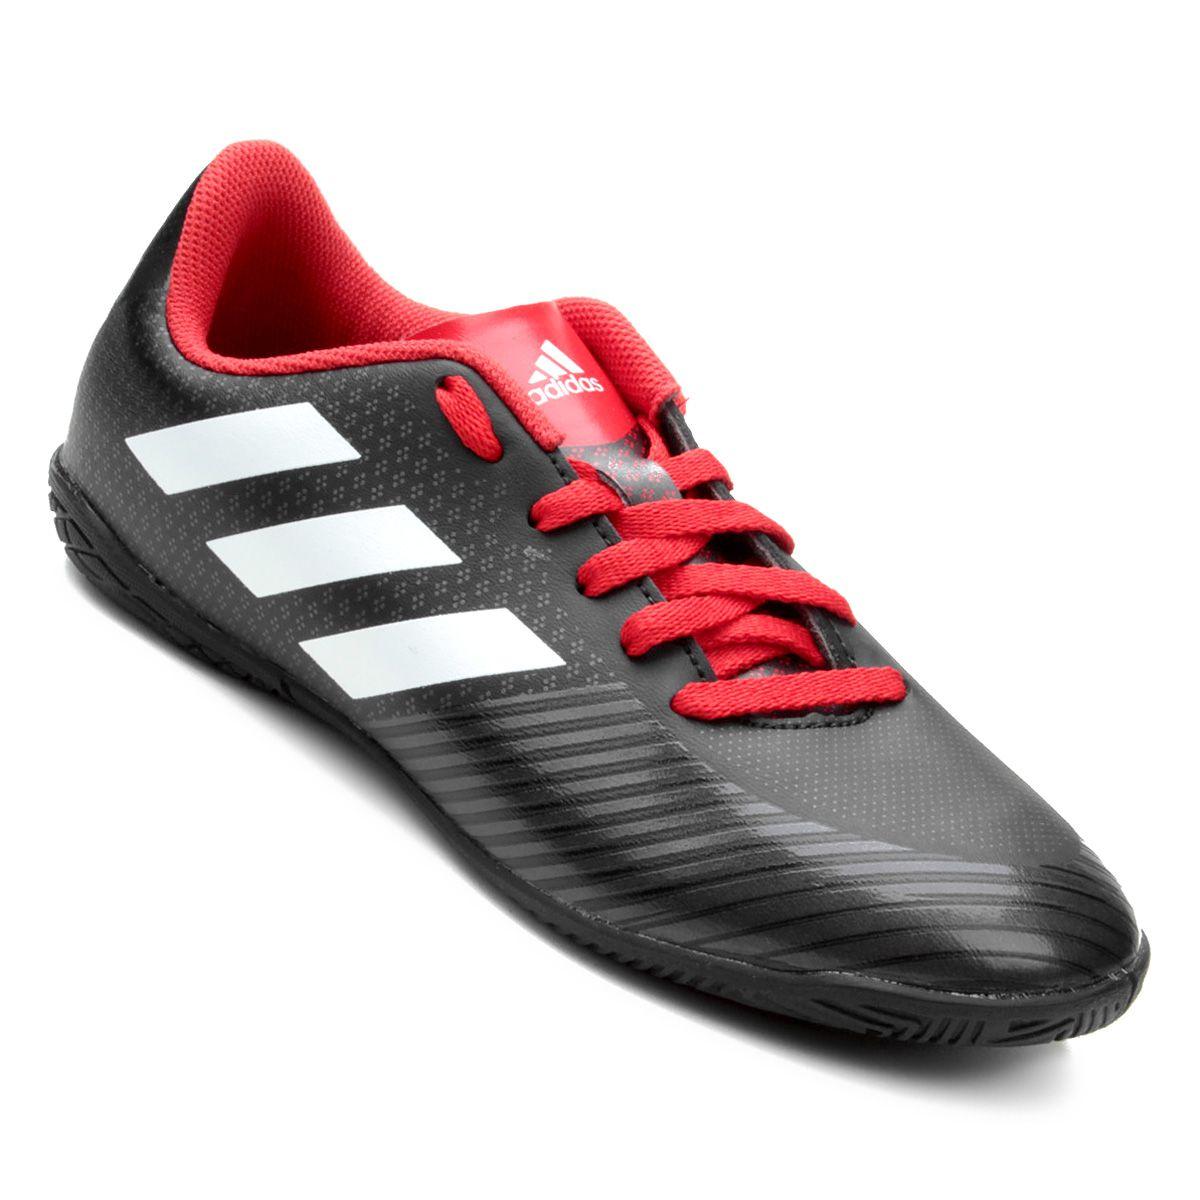 6b2326aa6c8ed Chuteira Futsal Infantil Adidas Artilheira Iii In - BRACIA SHOP ...